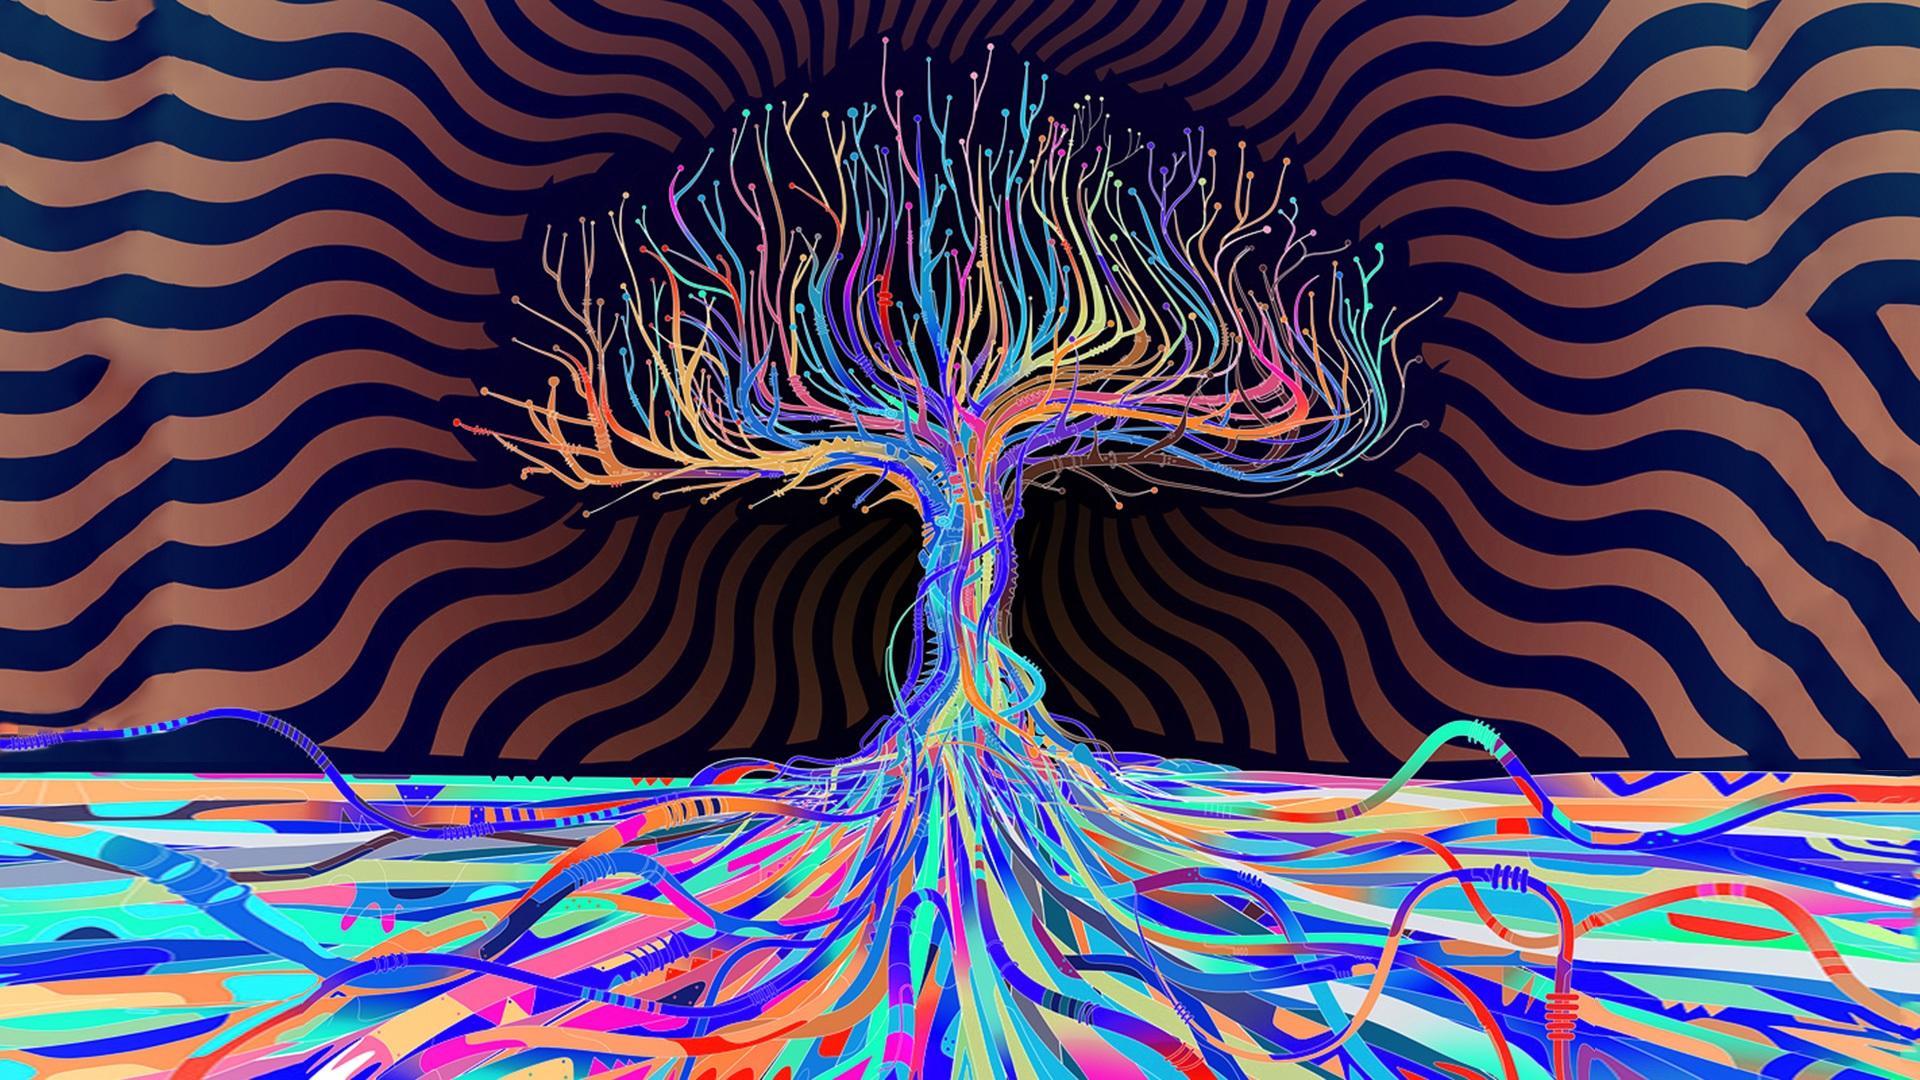 4k Psychedelic Wallpaper Peace